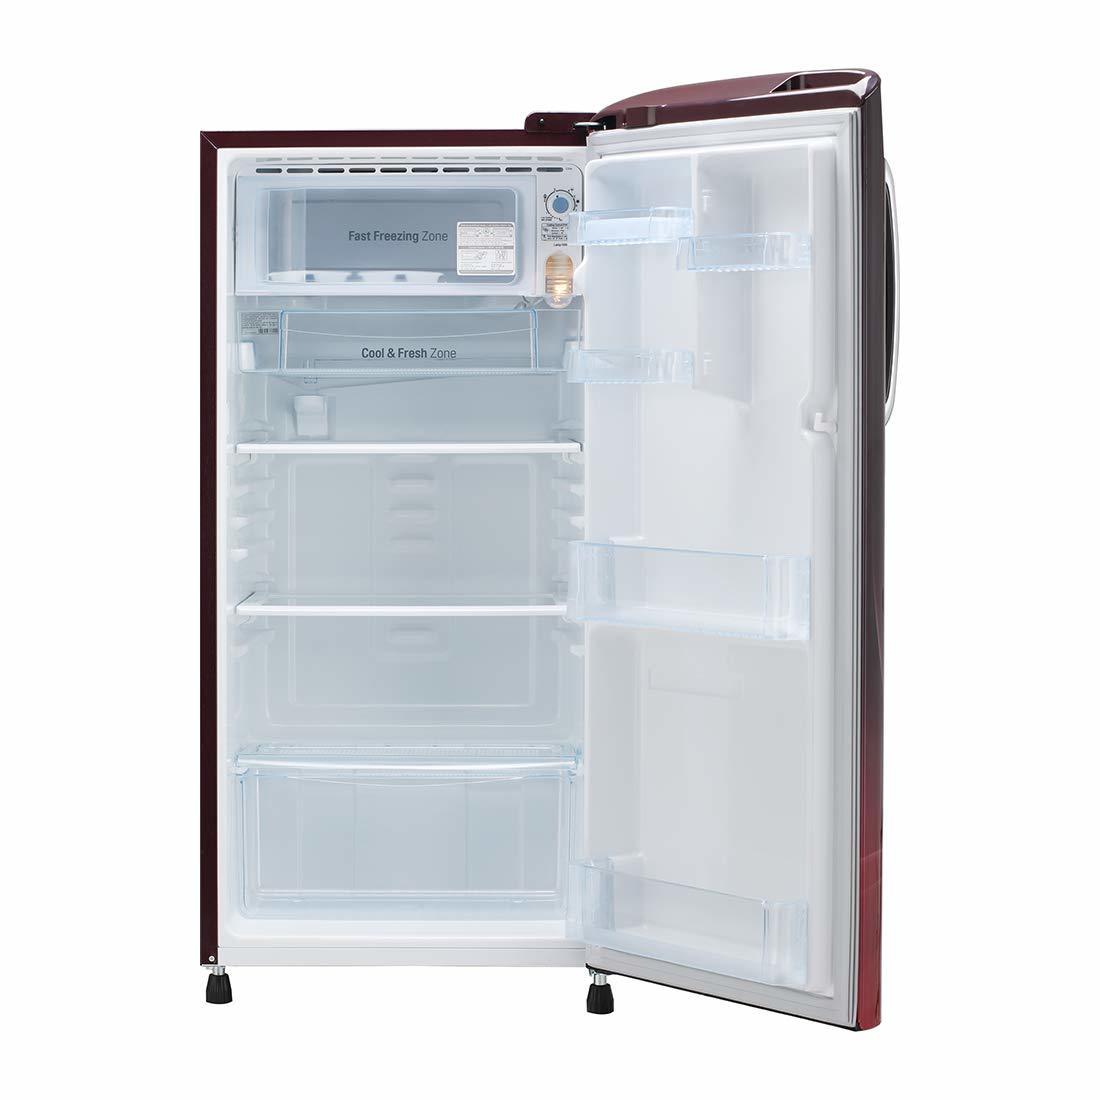 LG 190 L 5 Star ( 2019 ) Inverter Direct-Cool Single Door Refrigerator (GL-B201ASPY, Scarlet Plumeria)